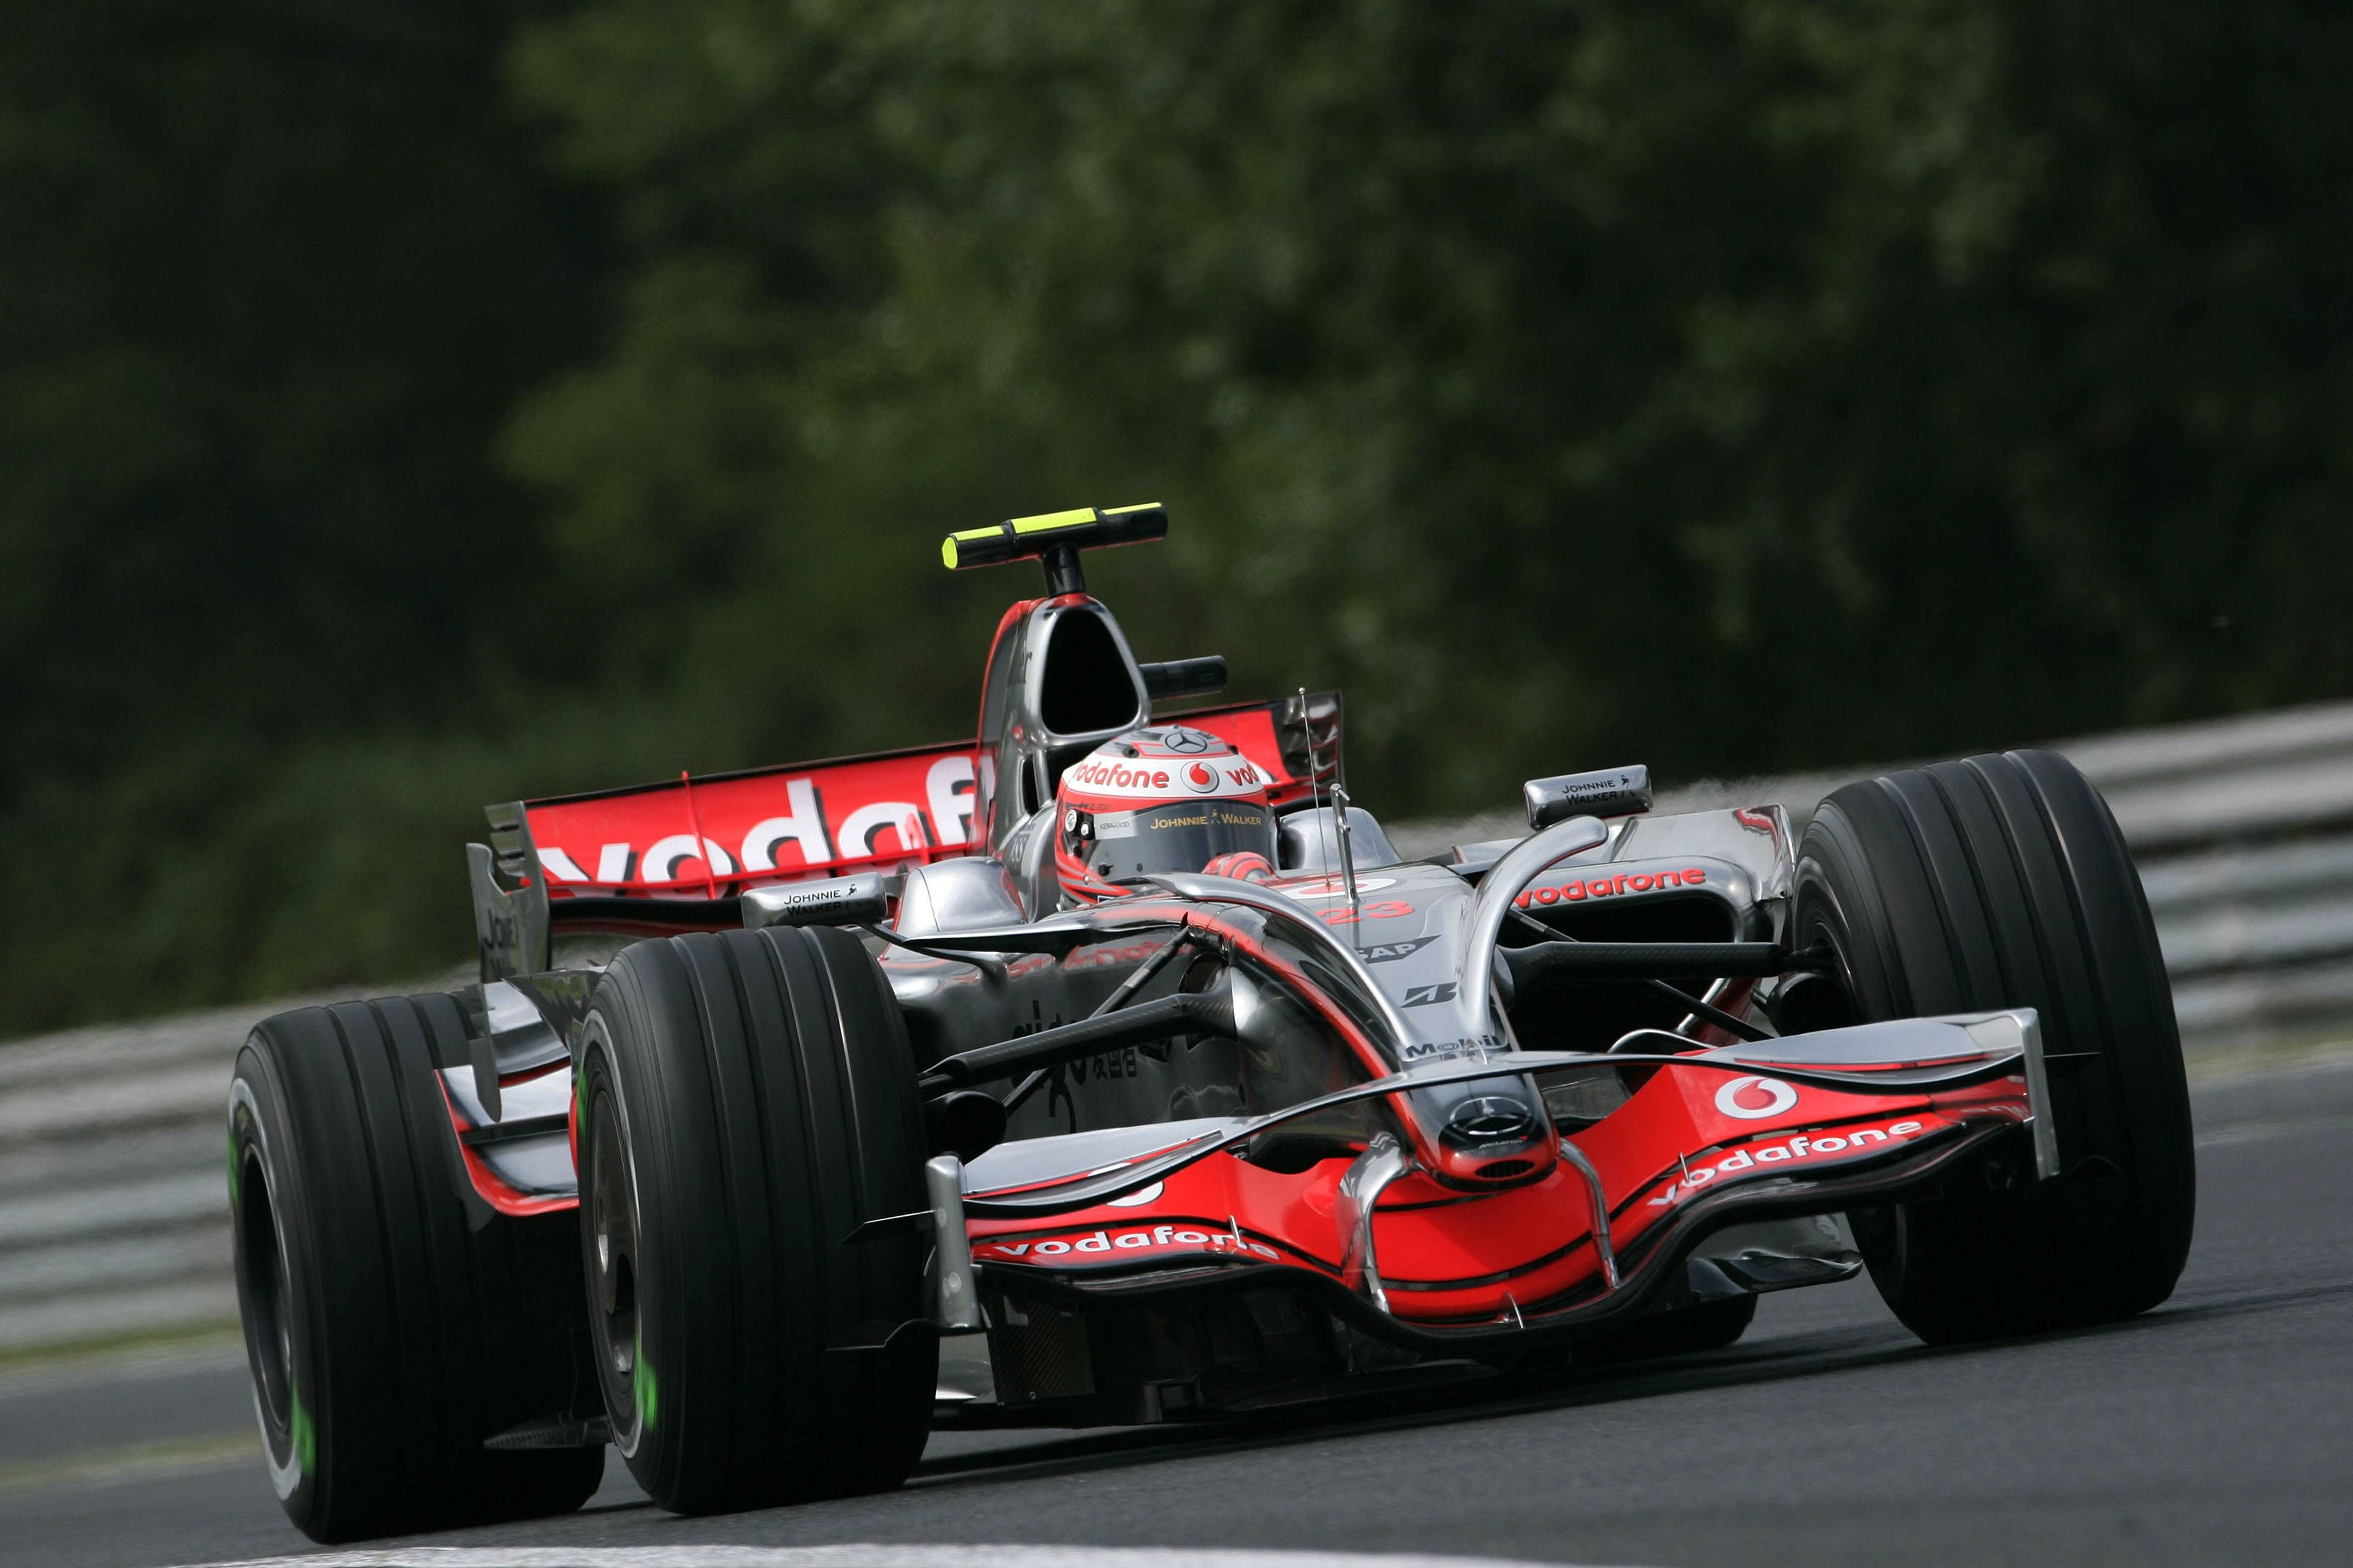 2008 McLaren MP4/23 - Mercedes (Heikki Kovalainen ...